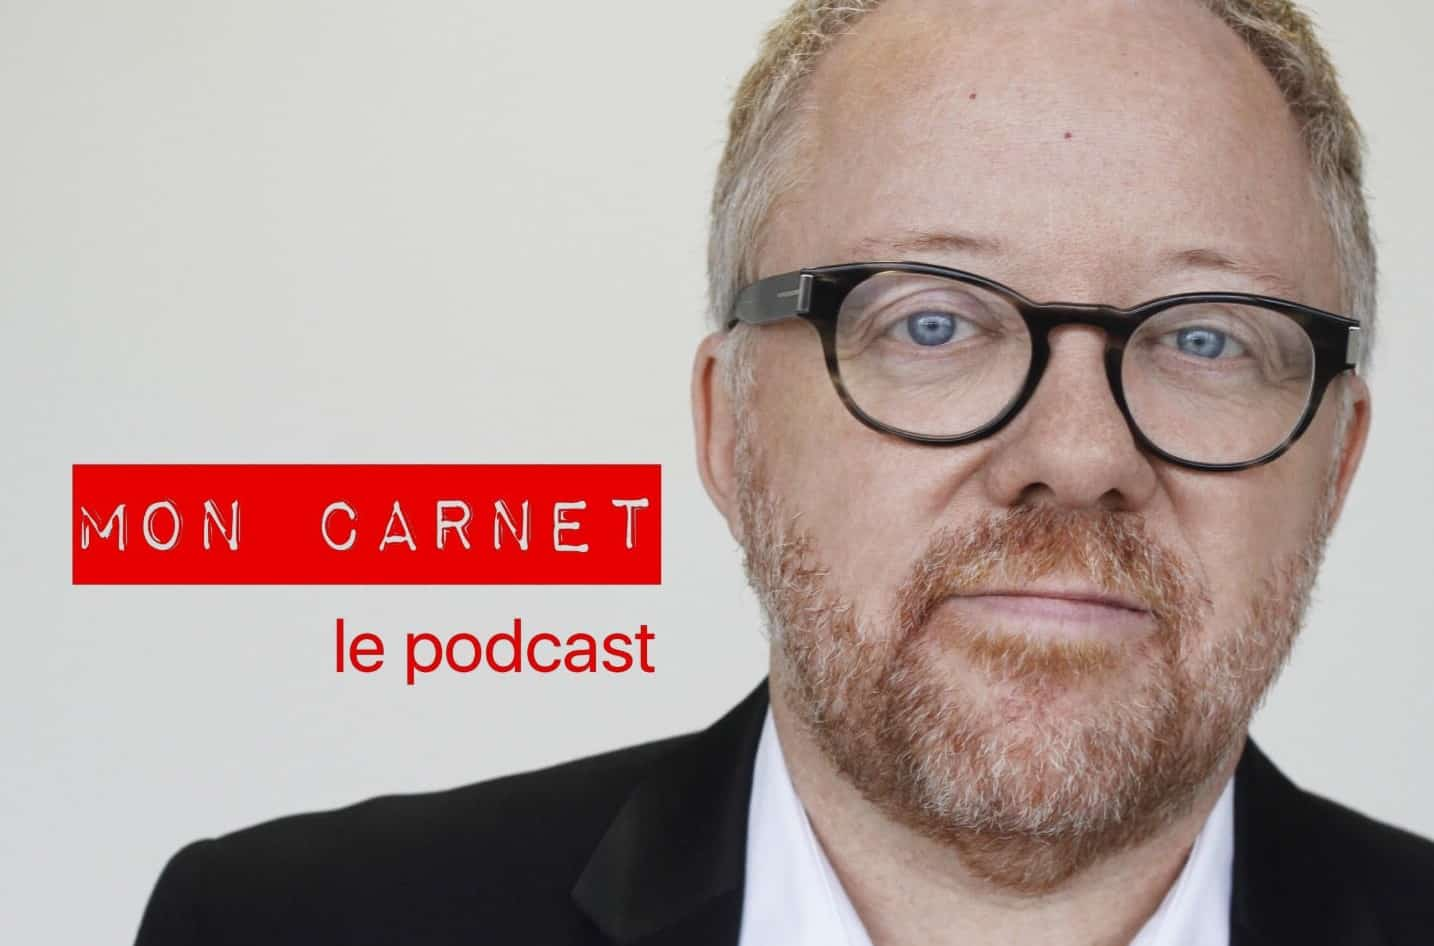 Dernier podcast de 2019 moncarnet avec Bruno Guglielminetti